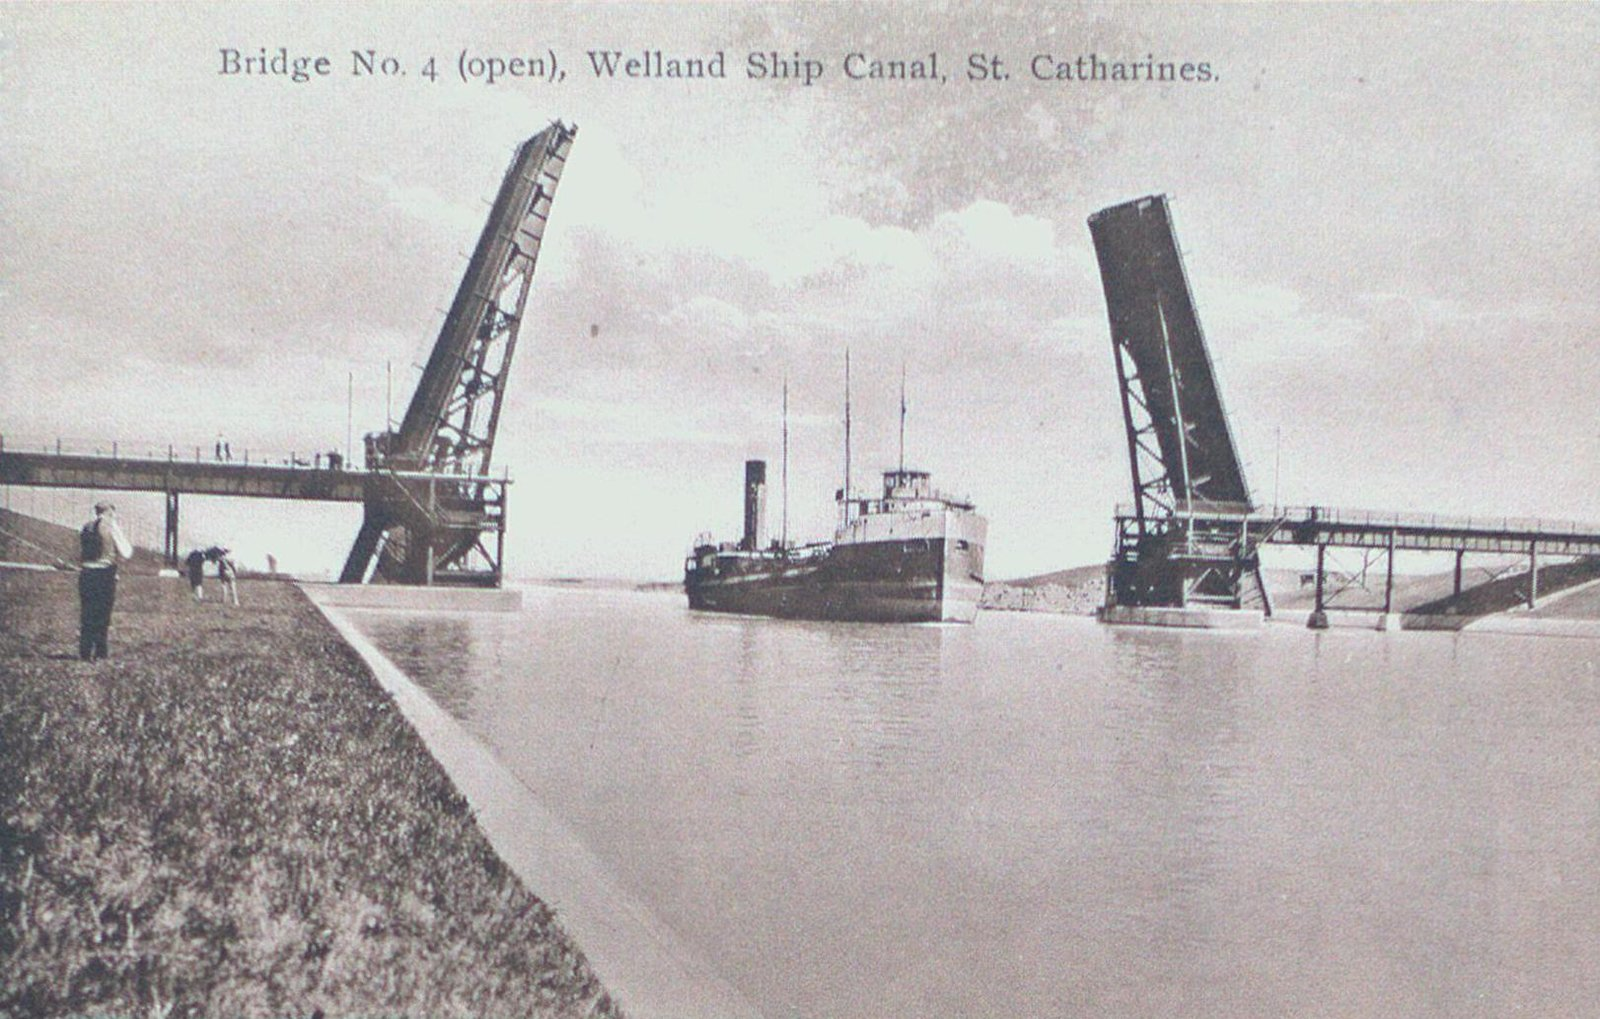 The Homer Lift Bridge on the Welland Ship Canal